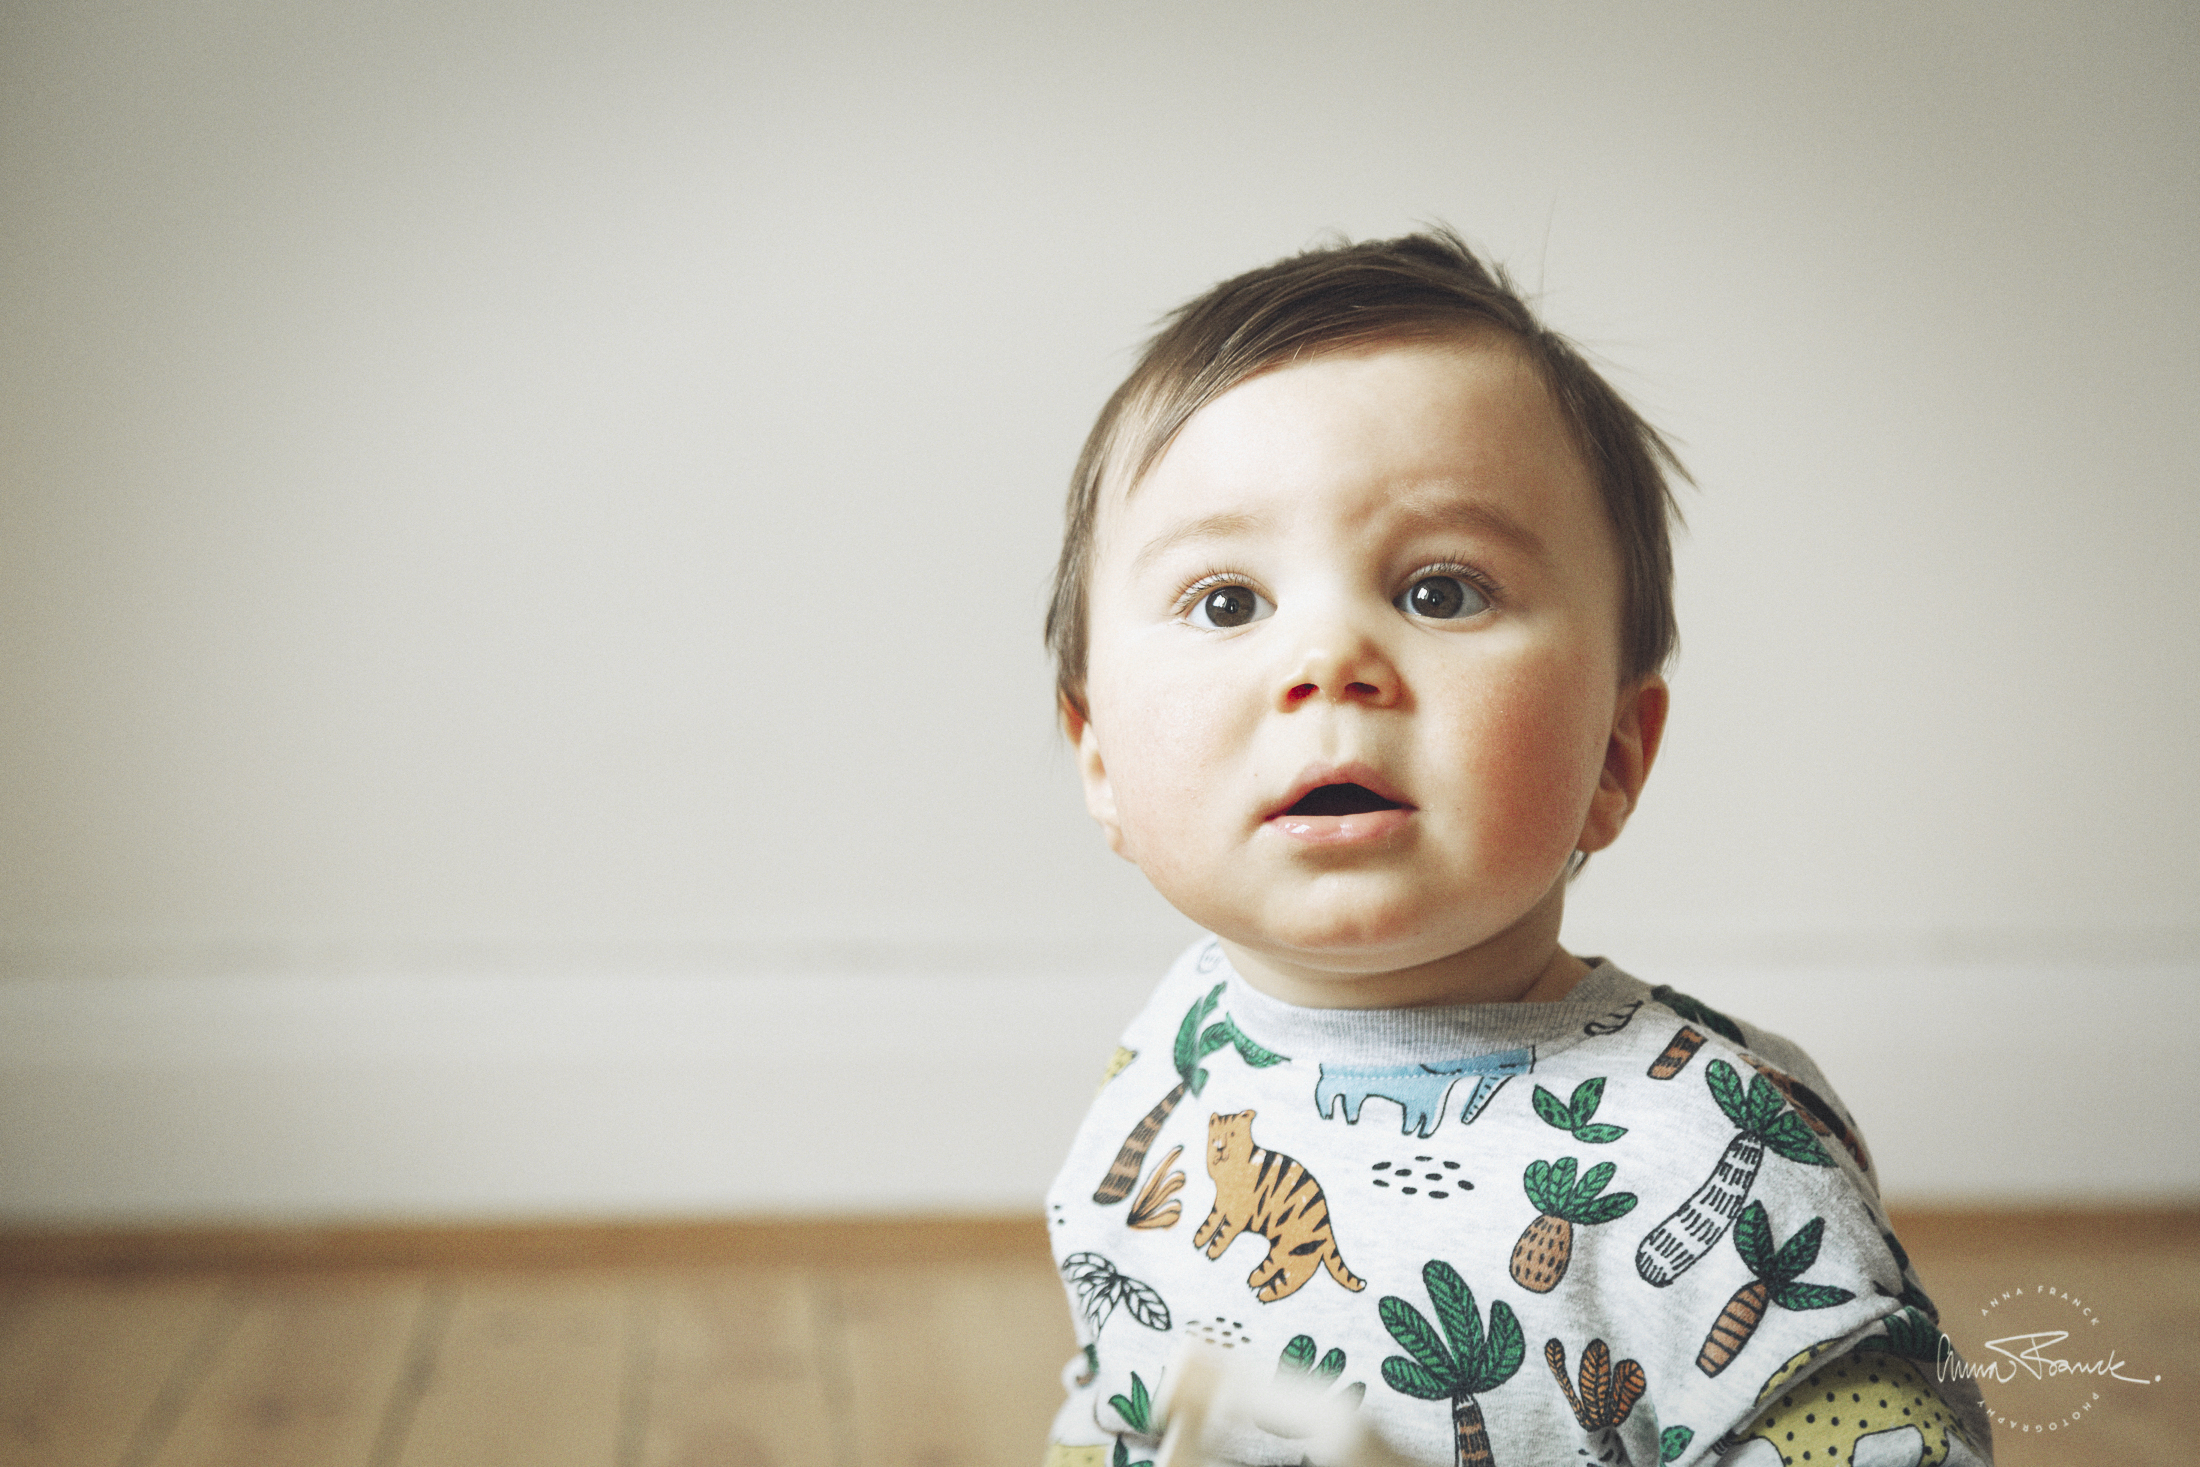 barnfotografering i Stockholm